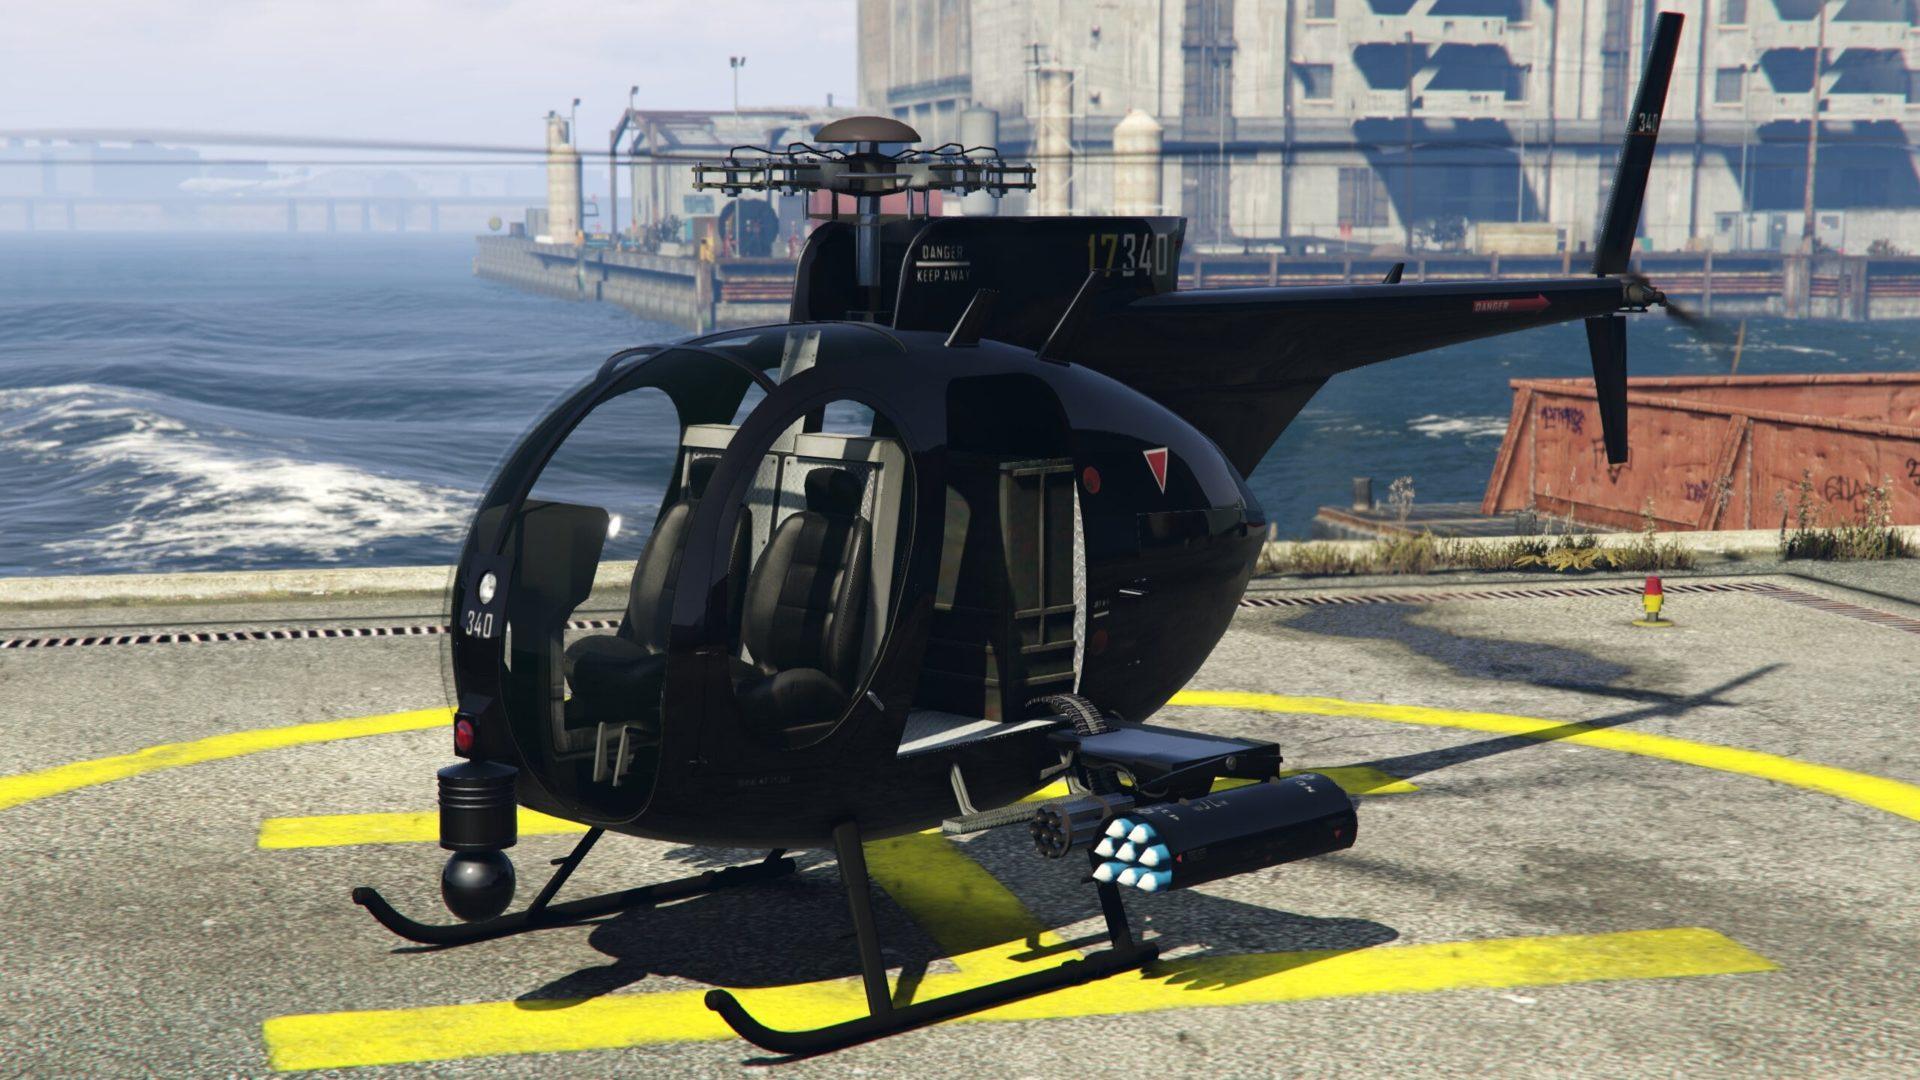 Buzzard attack chopper GTA